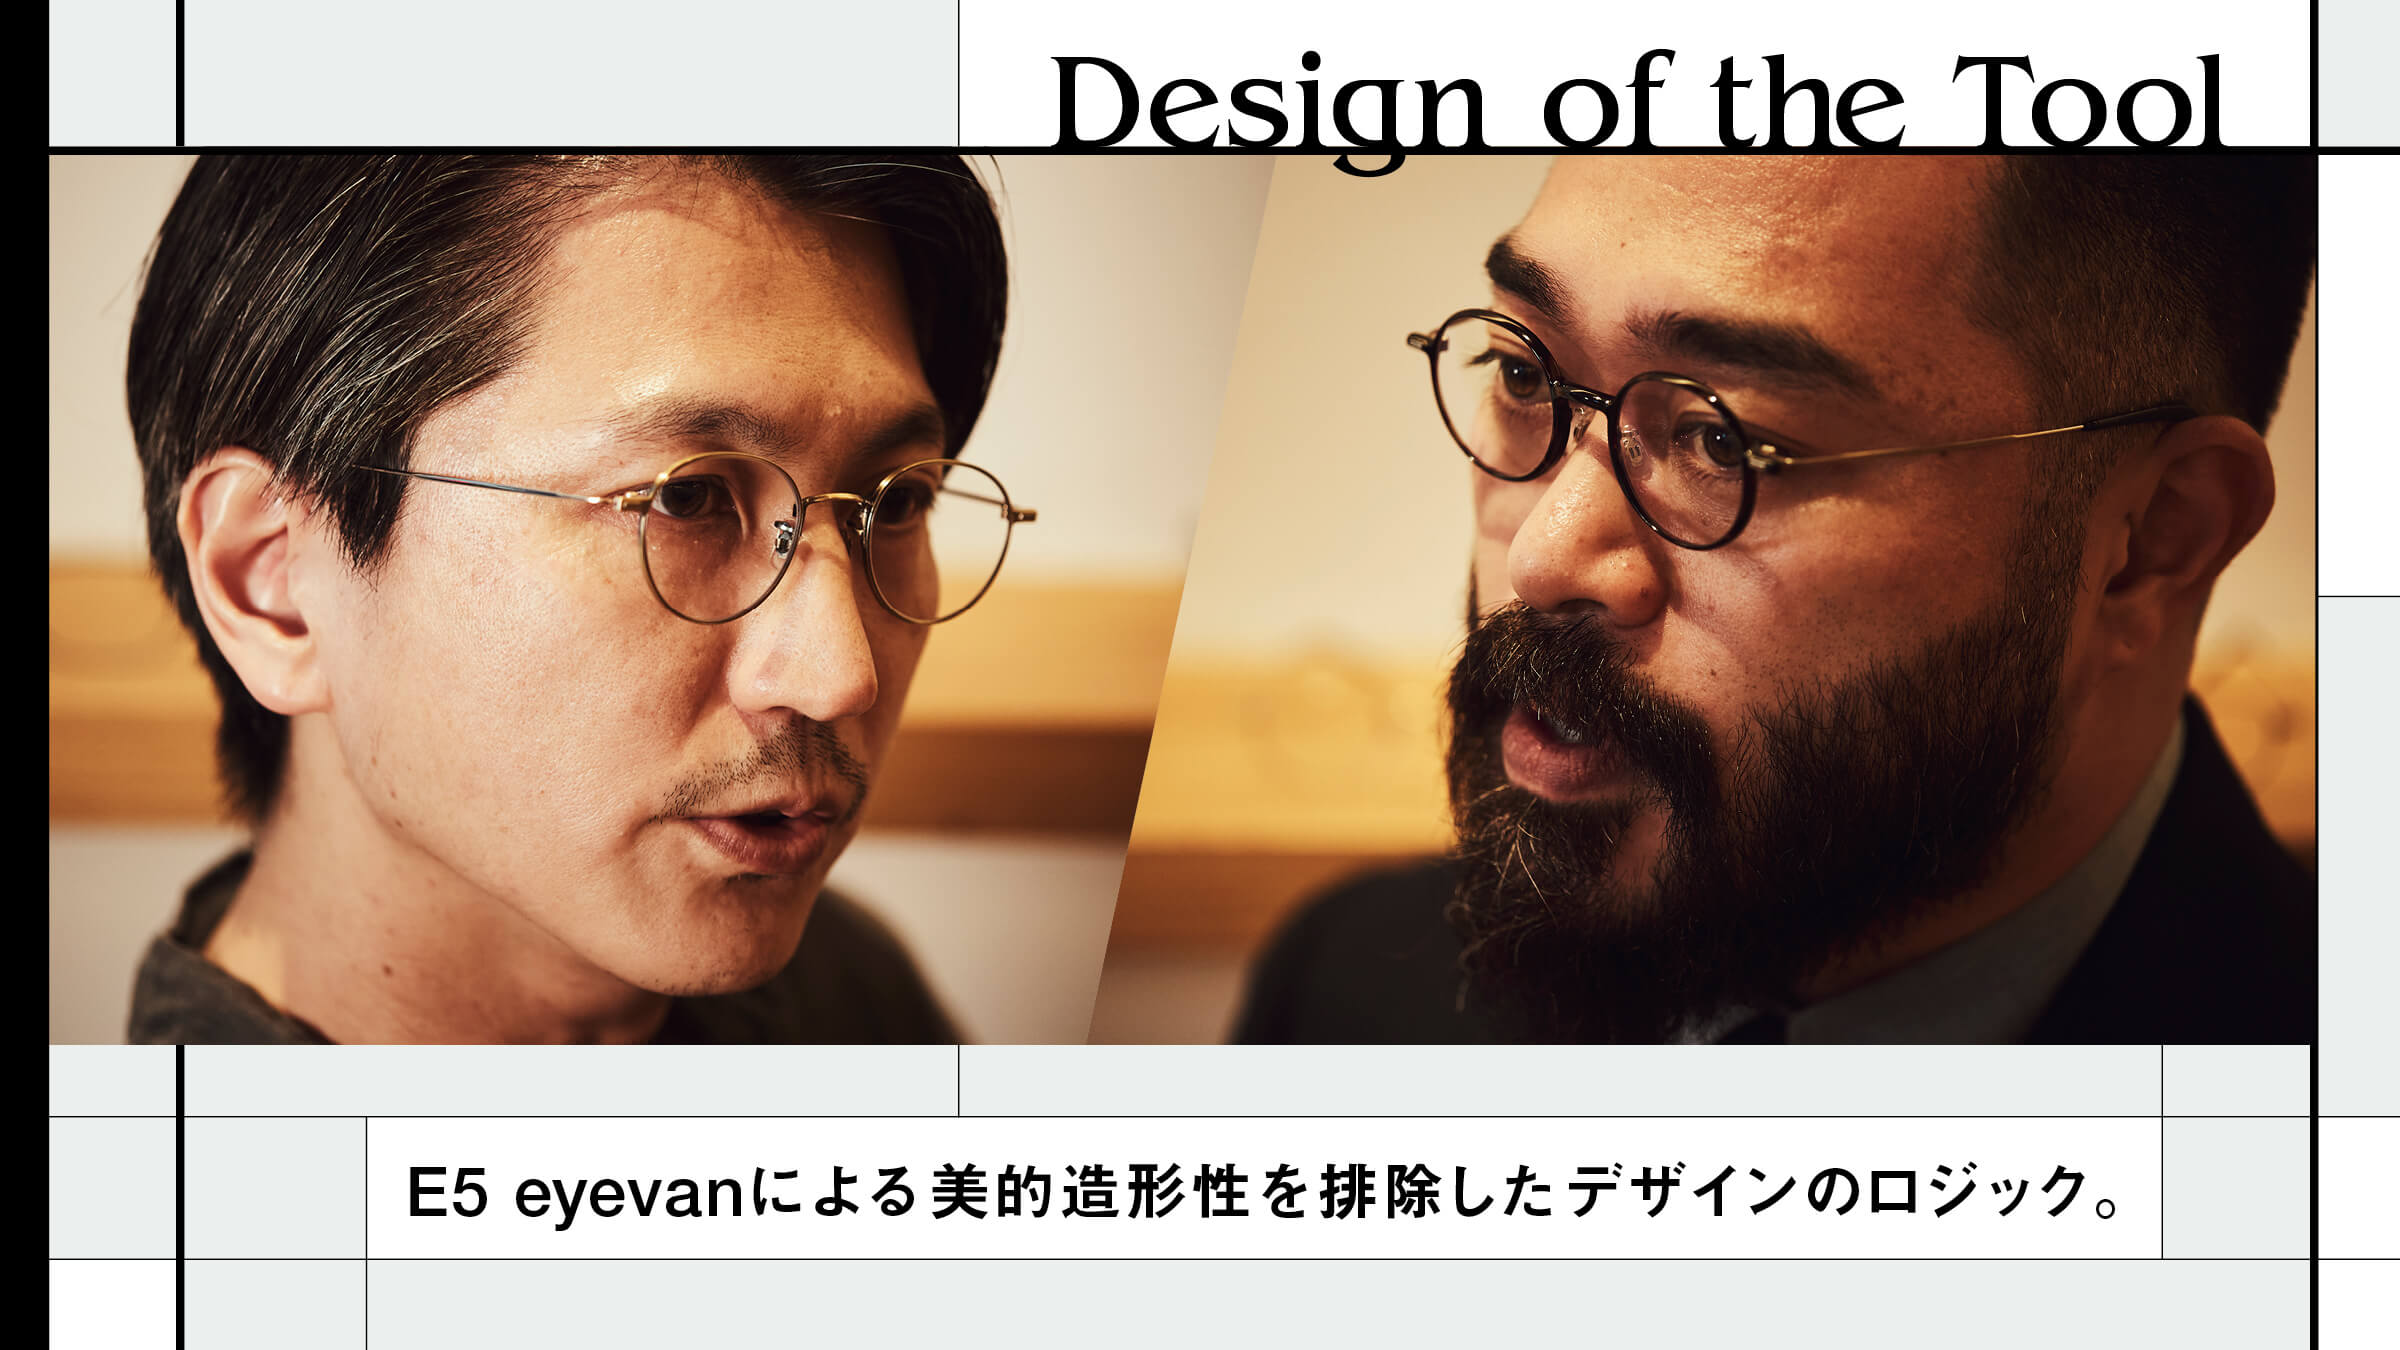 E5eyevanによる美的造形性を排除したデザインのロジック。